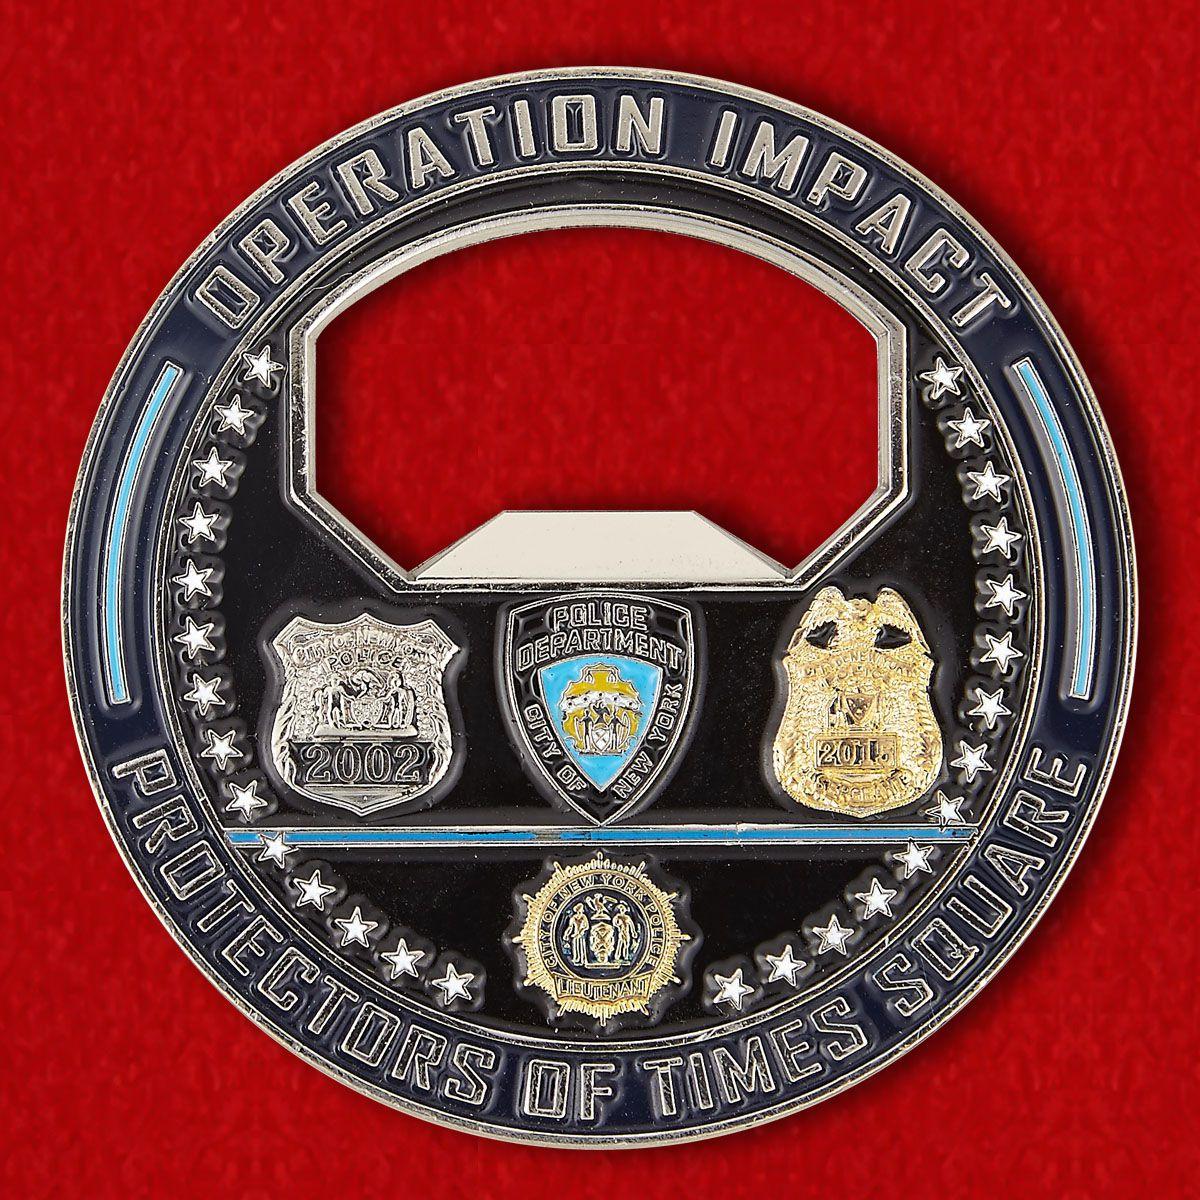 Челлендж коин-открывалка Департамента полиции Нью-Йорка